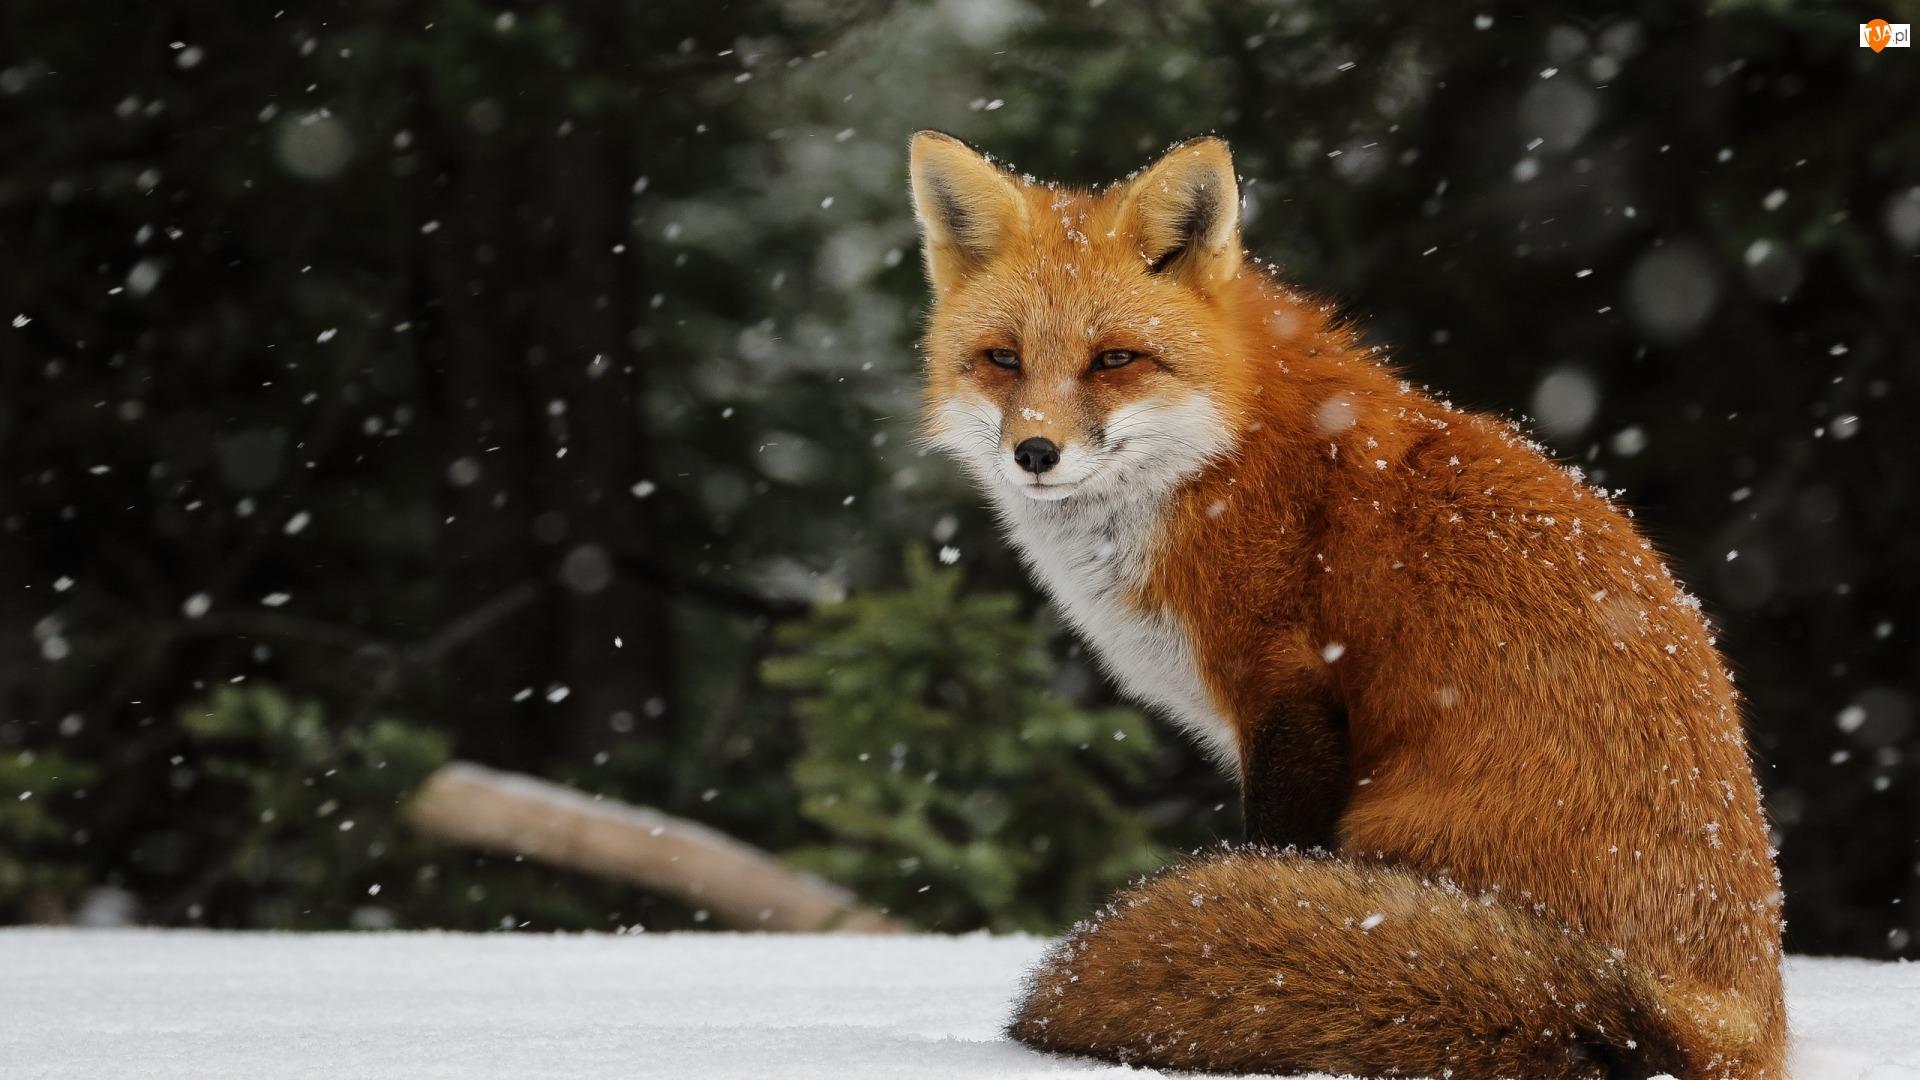 Rudy, Śnieg, Lis, Zima